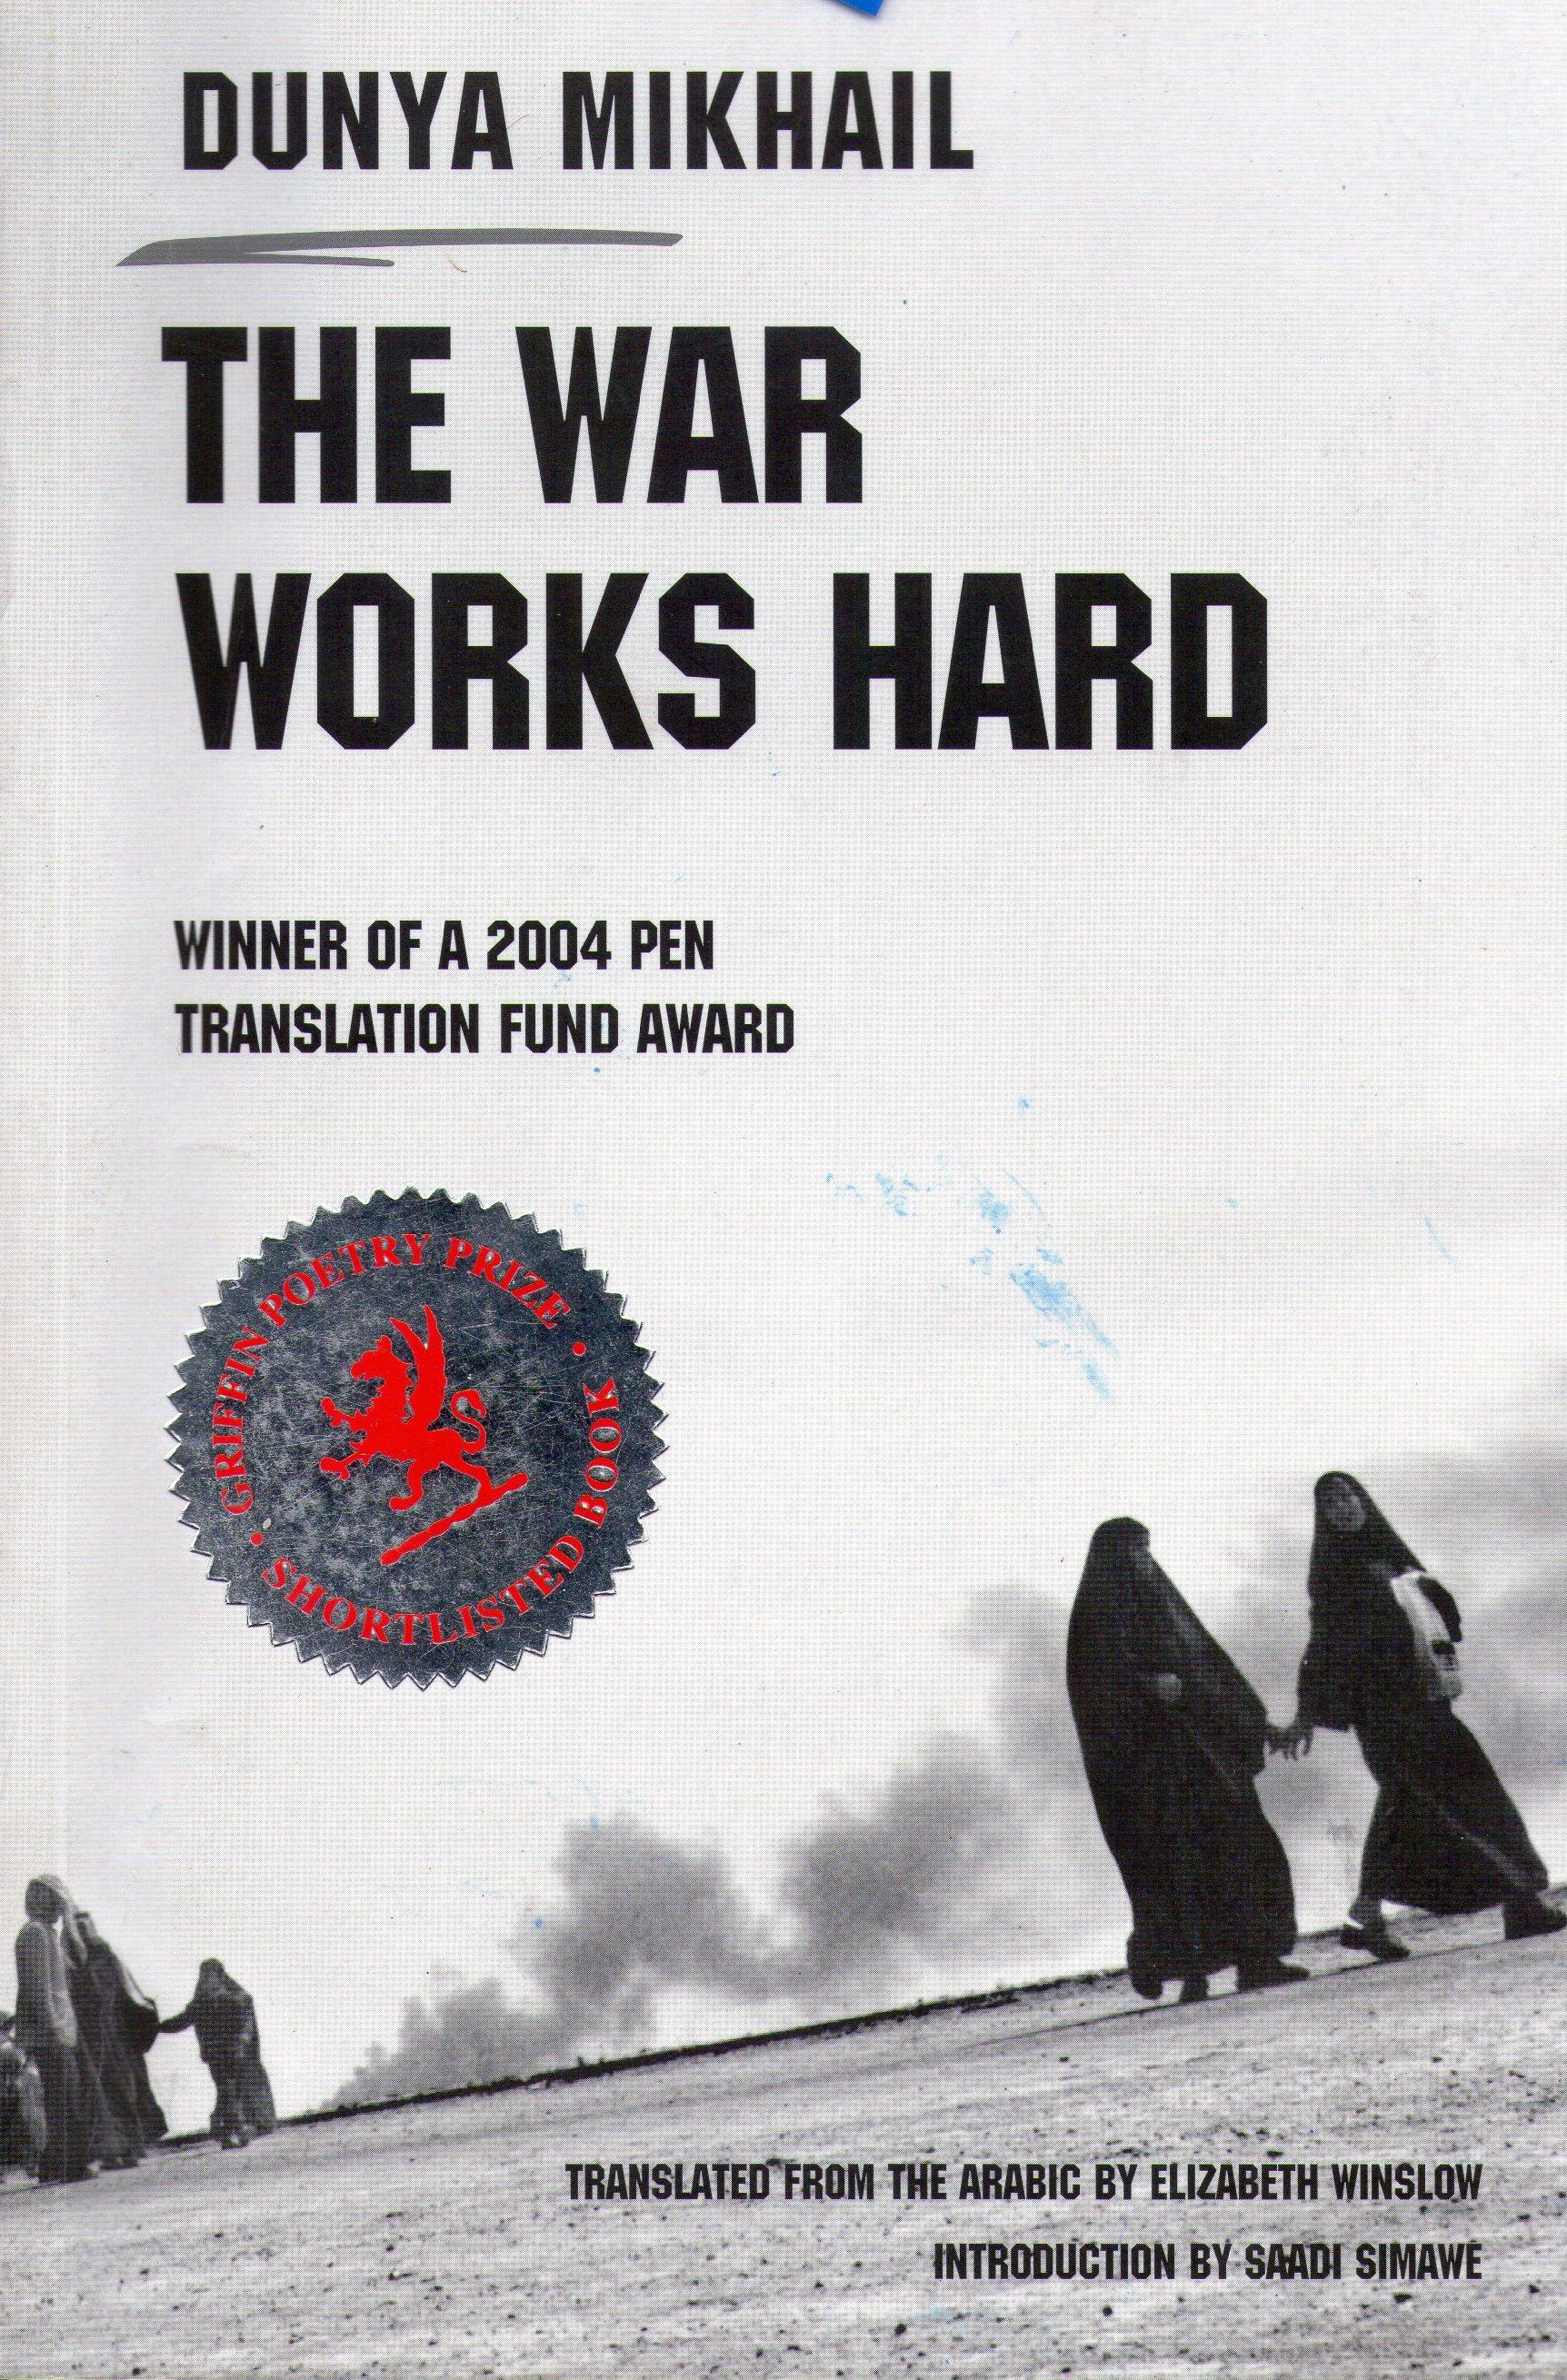 The War Works Hard by Dunya Mikhai